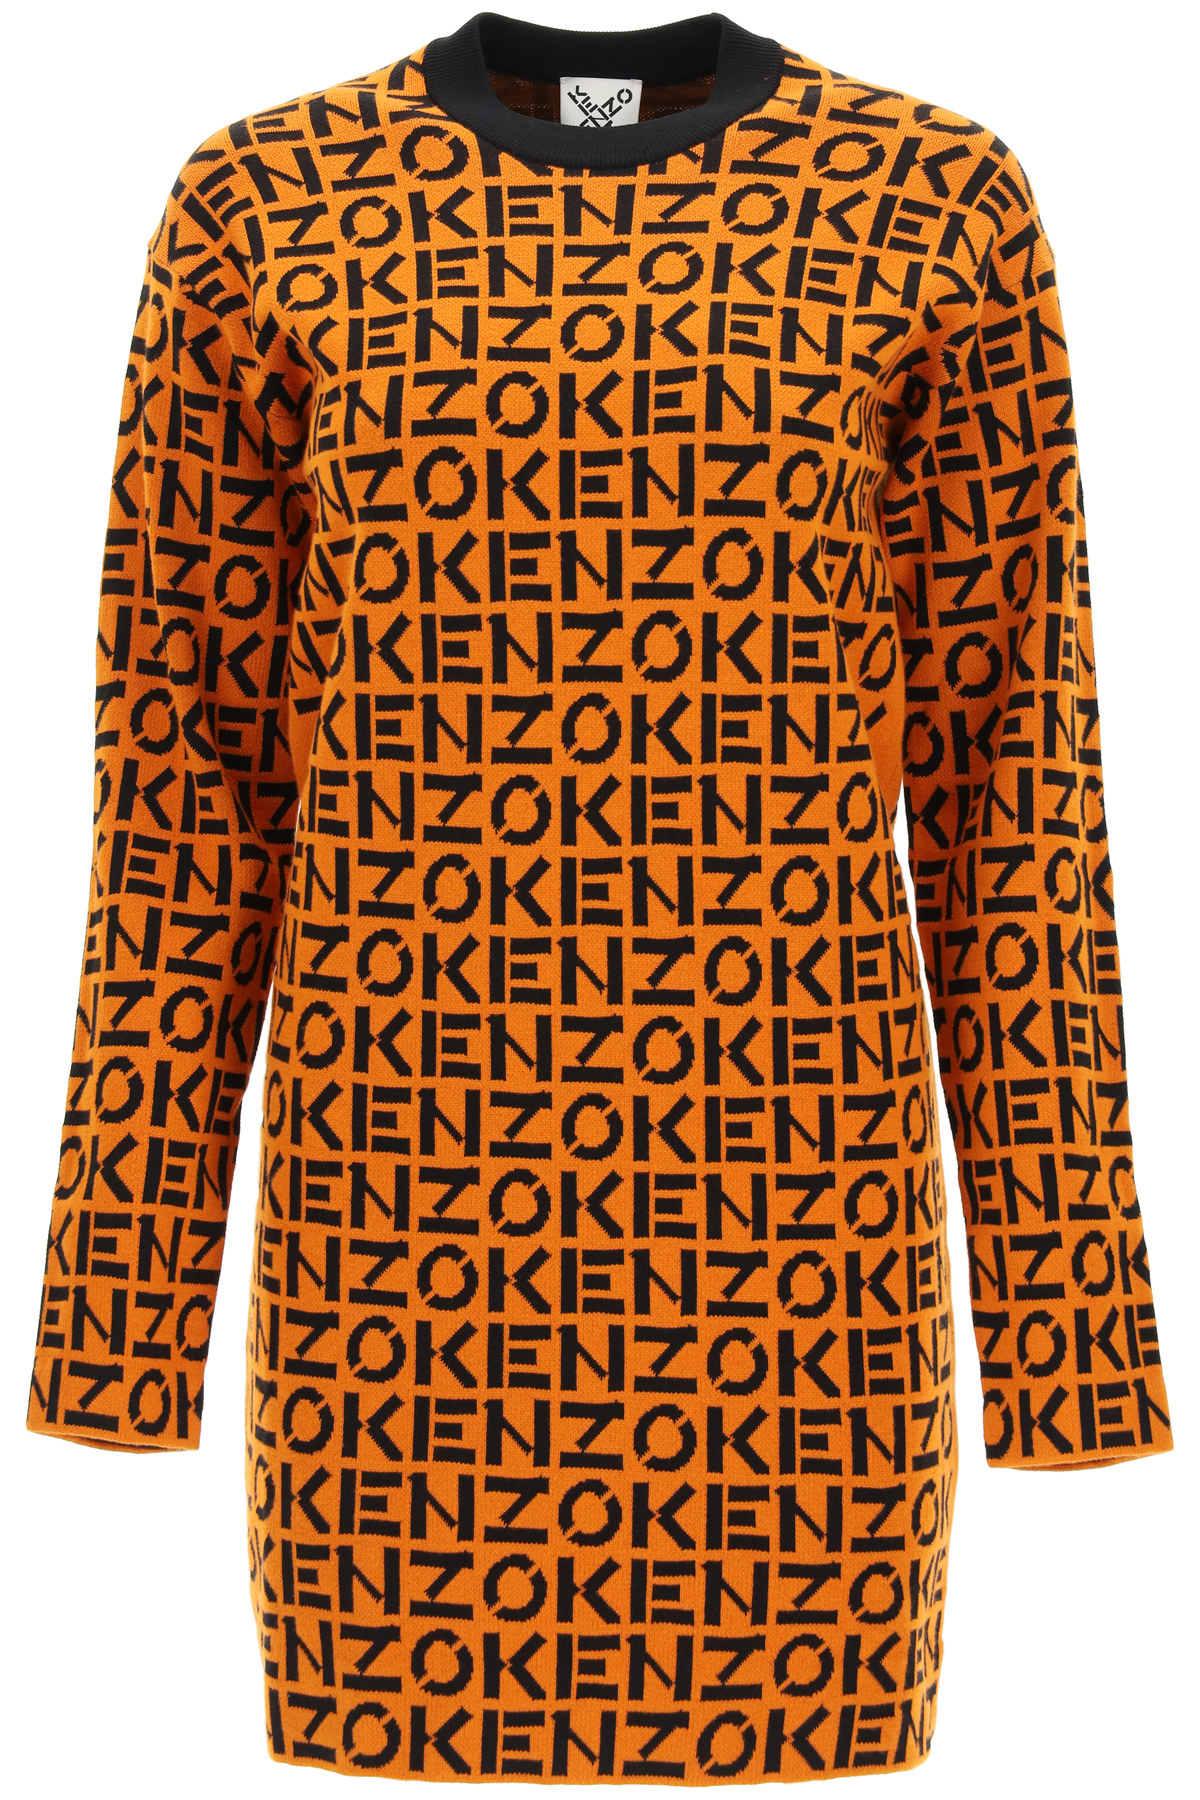 Kenzo miniabito monogramma kenzo sport